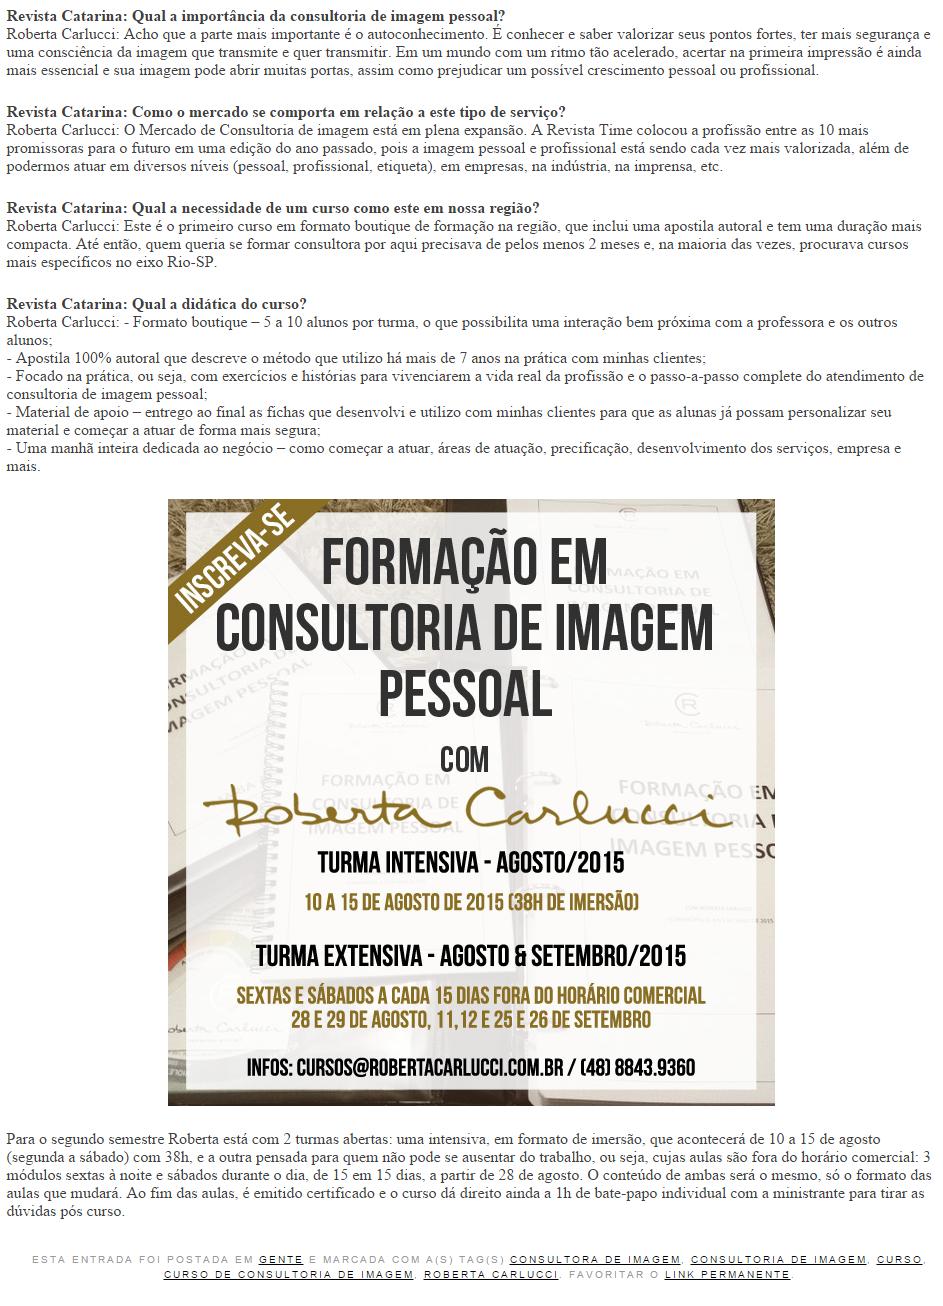 Curso de Consultoria de Imagem com Roberta Carlucci   Revista Catarina 2